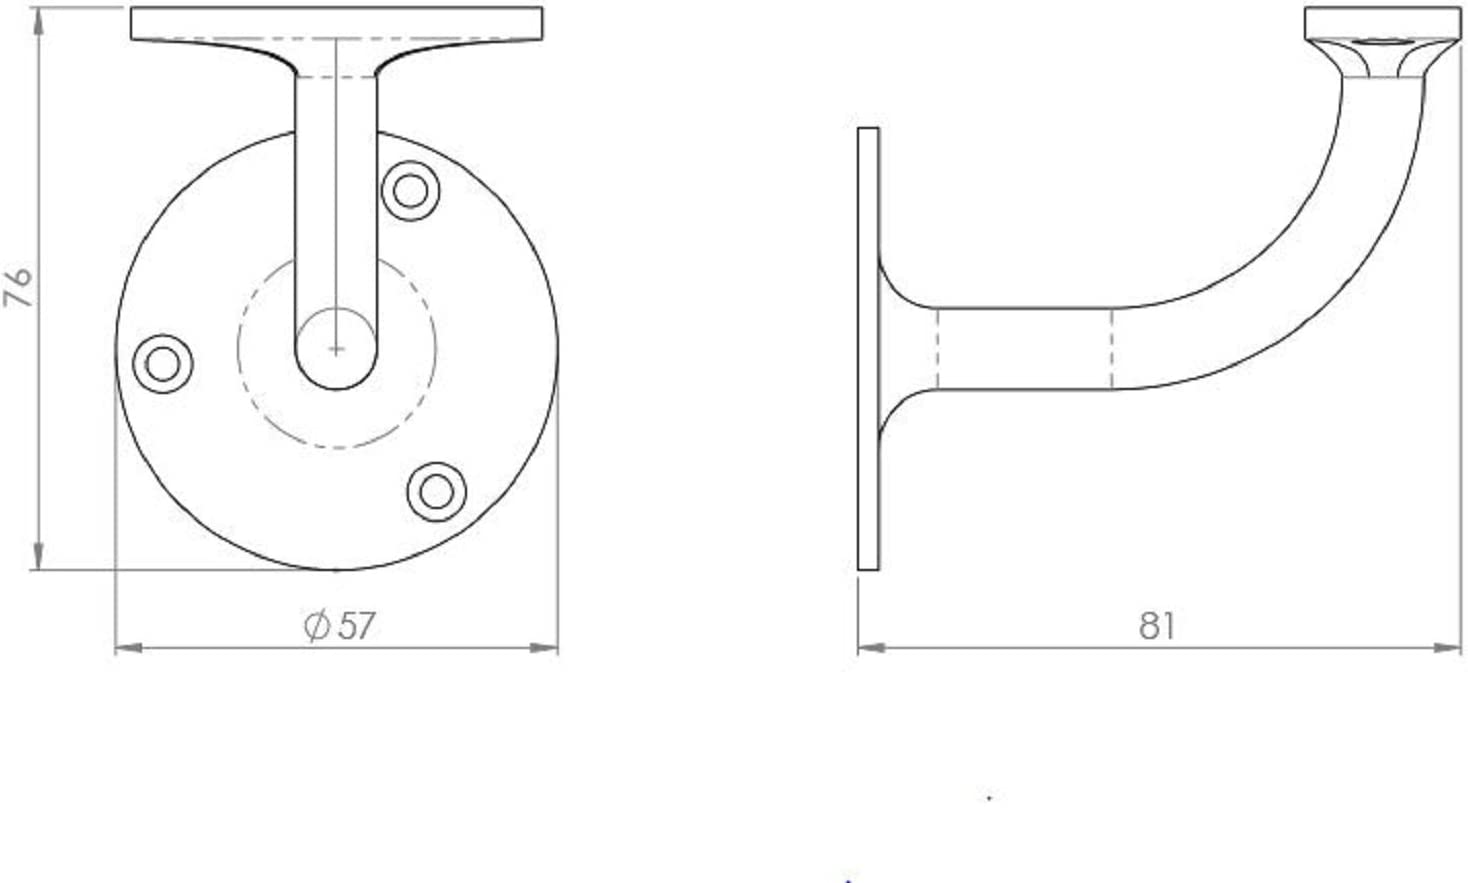 Carlisle Brass Quality AA84 Heavyweight Handrail Bracket 64mm Polished Chrome